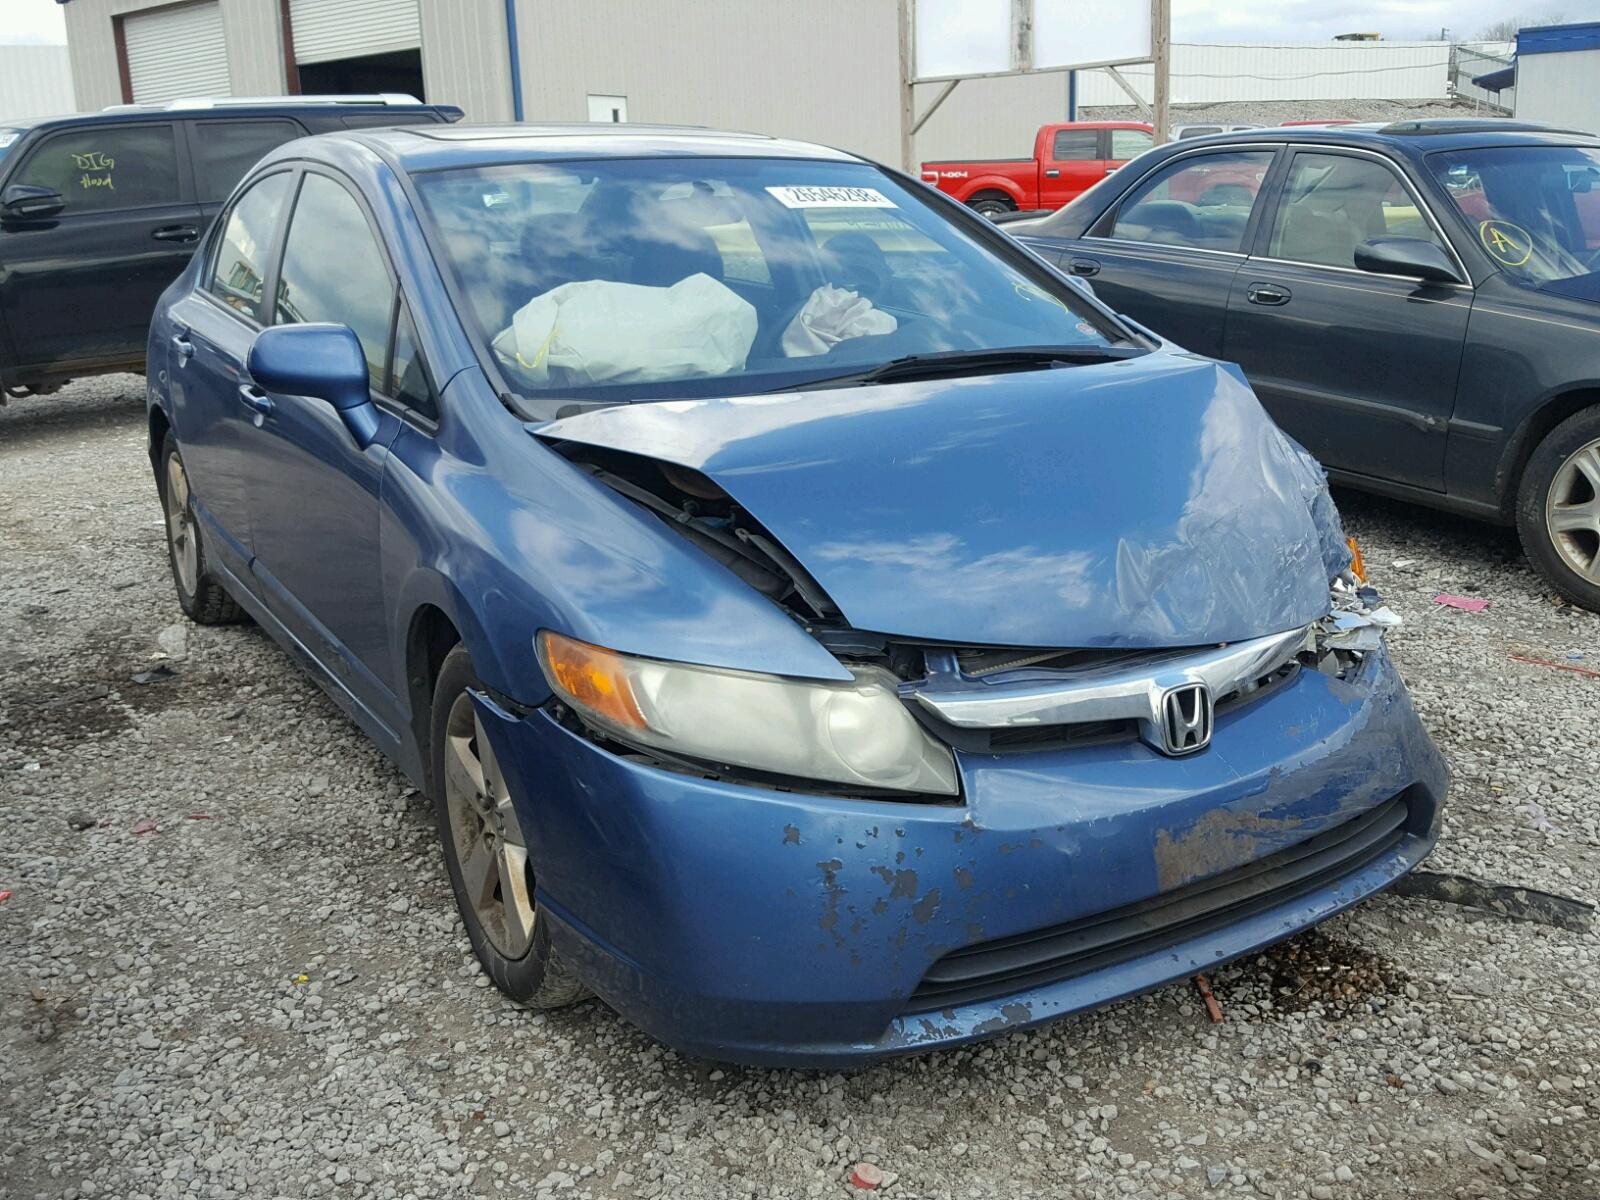 Honda Springfield Pa >> Auto Auction Ended on VIN: JHMBB6240VC009422 1997 HONDA ...